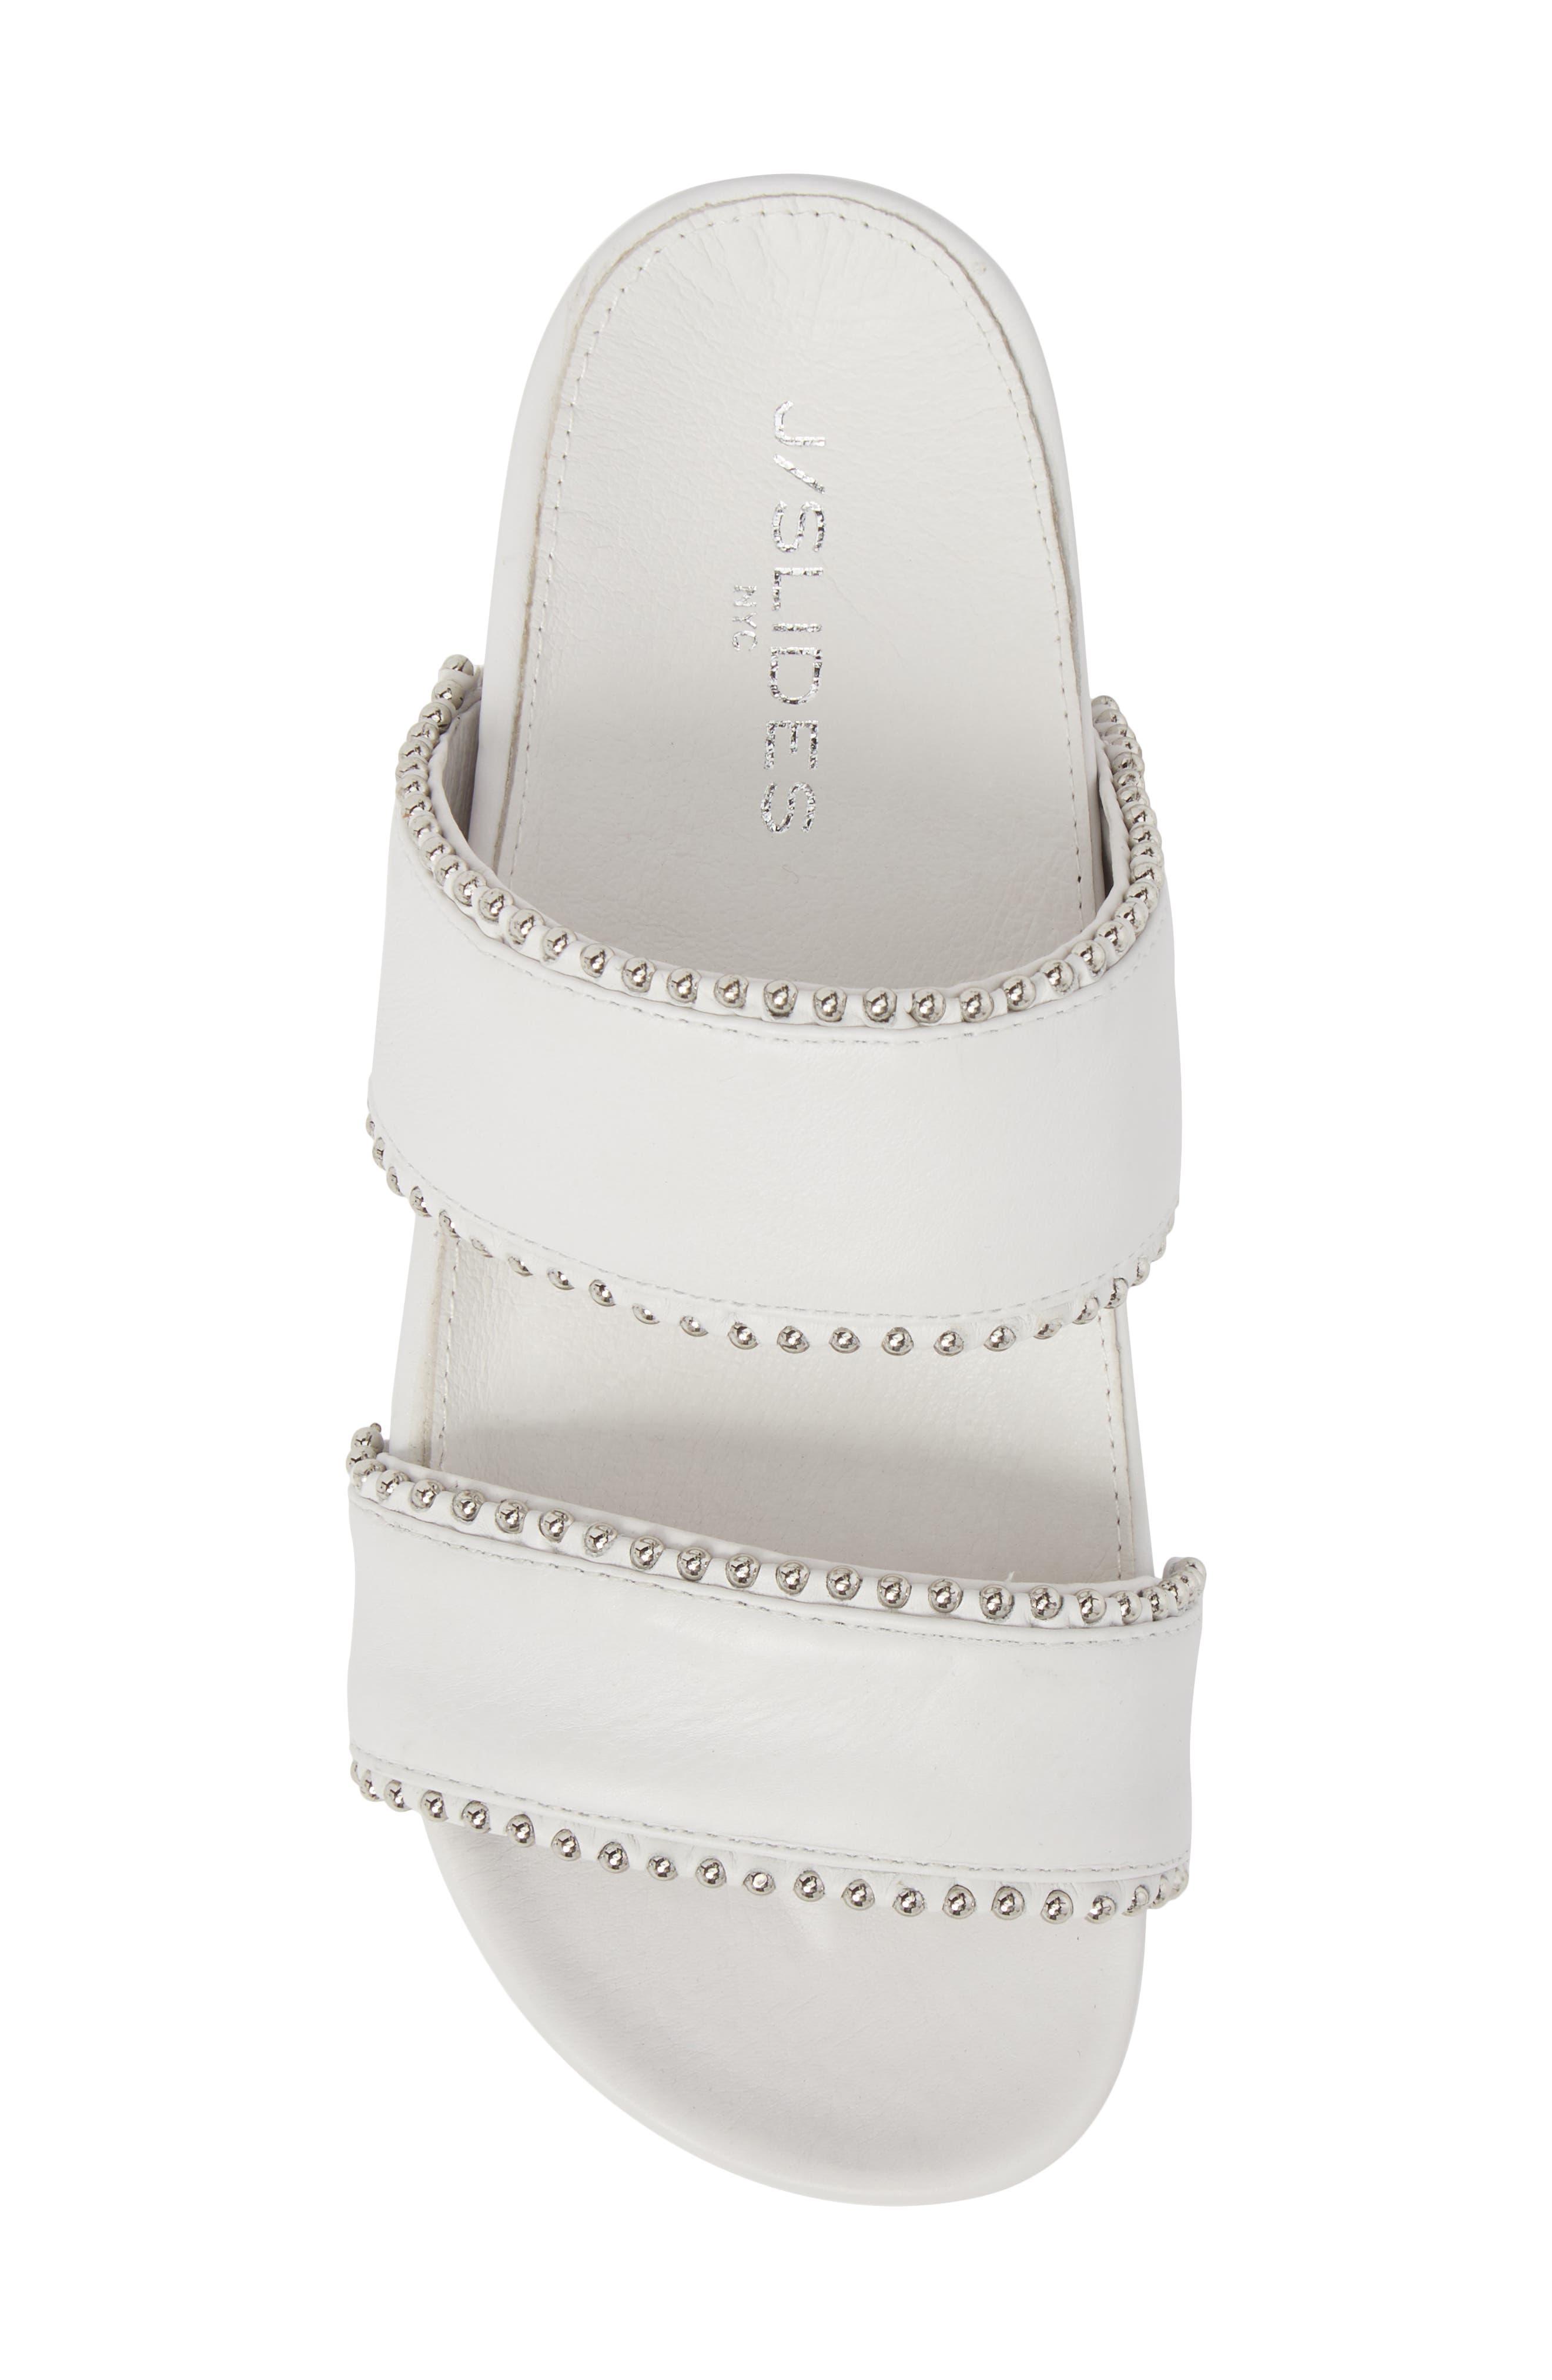 Emmie Bead Chain Slide Sandal,                             Alternate thumbnail 5, color,                             White Leather